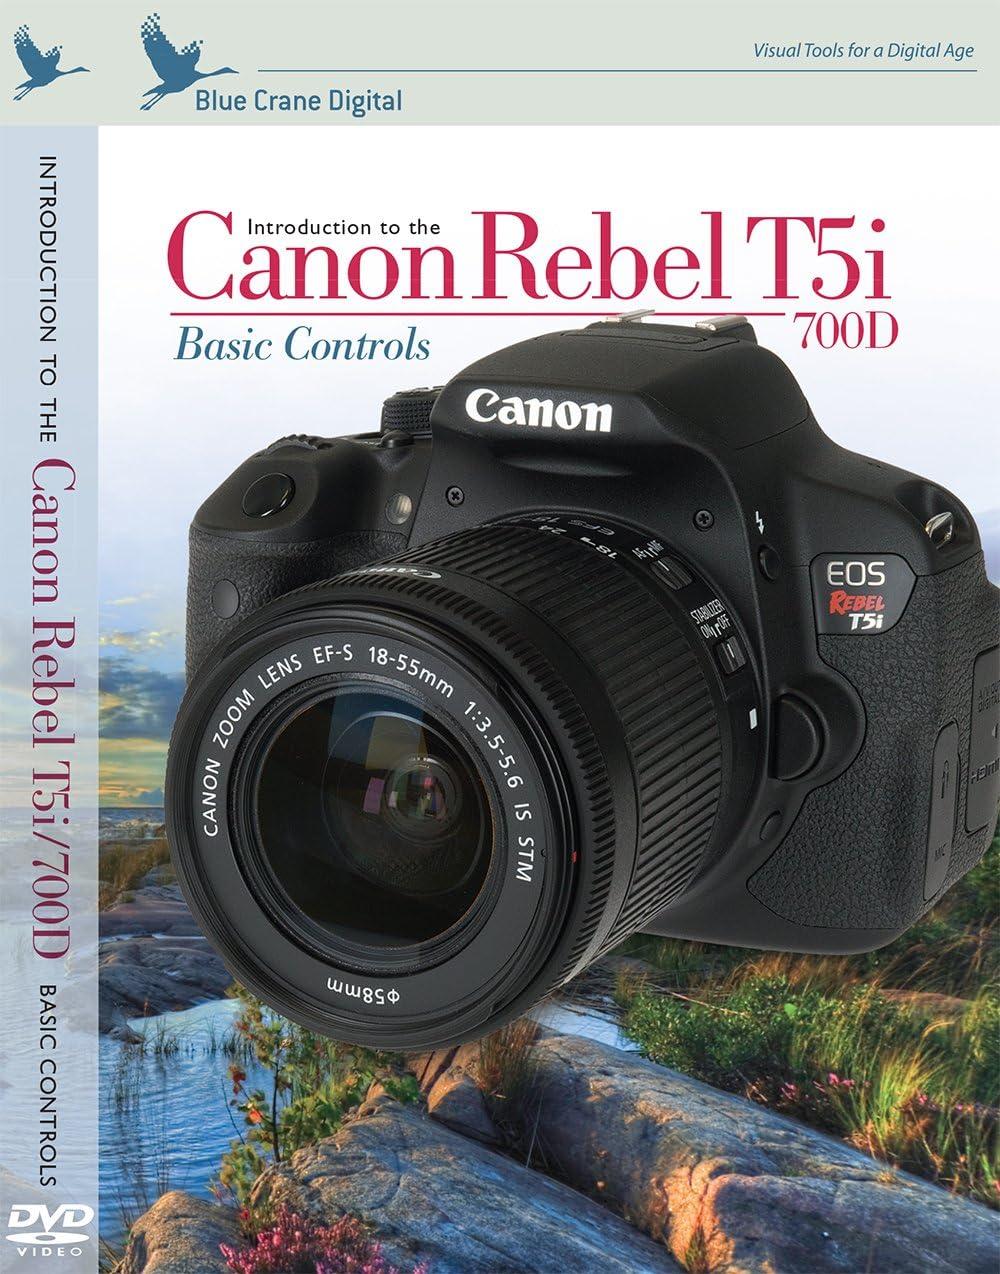 Blue Crane Digital Canon Rebel T5i//700D inBrief Laminated Reference Card zBC554